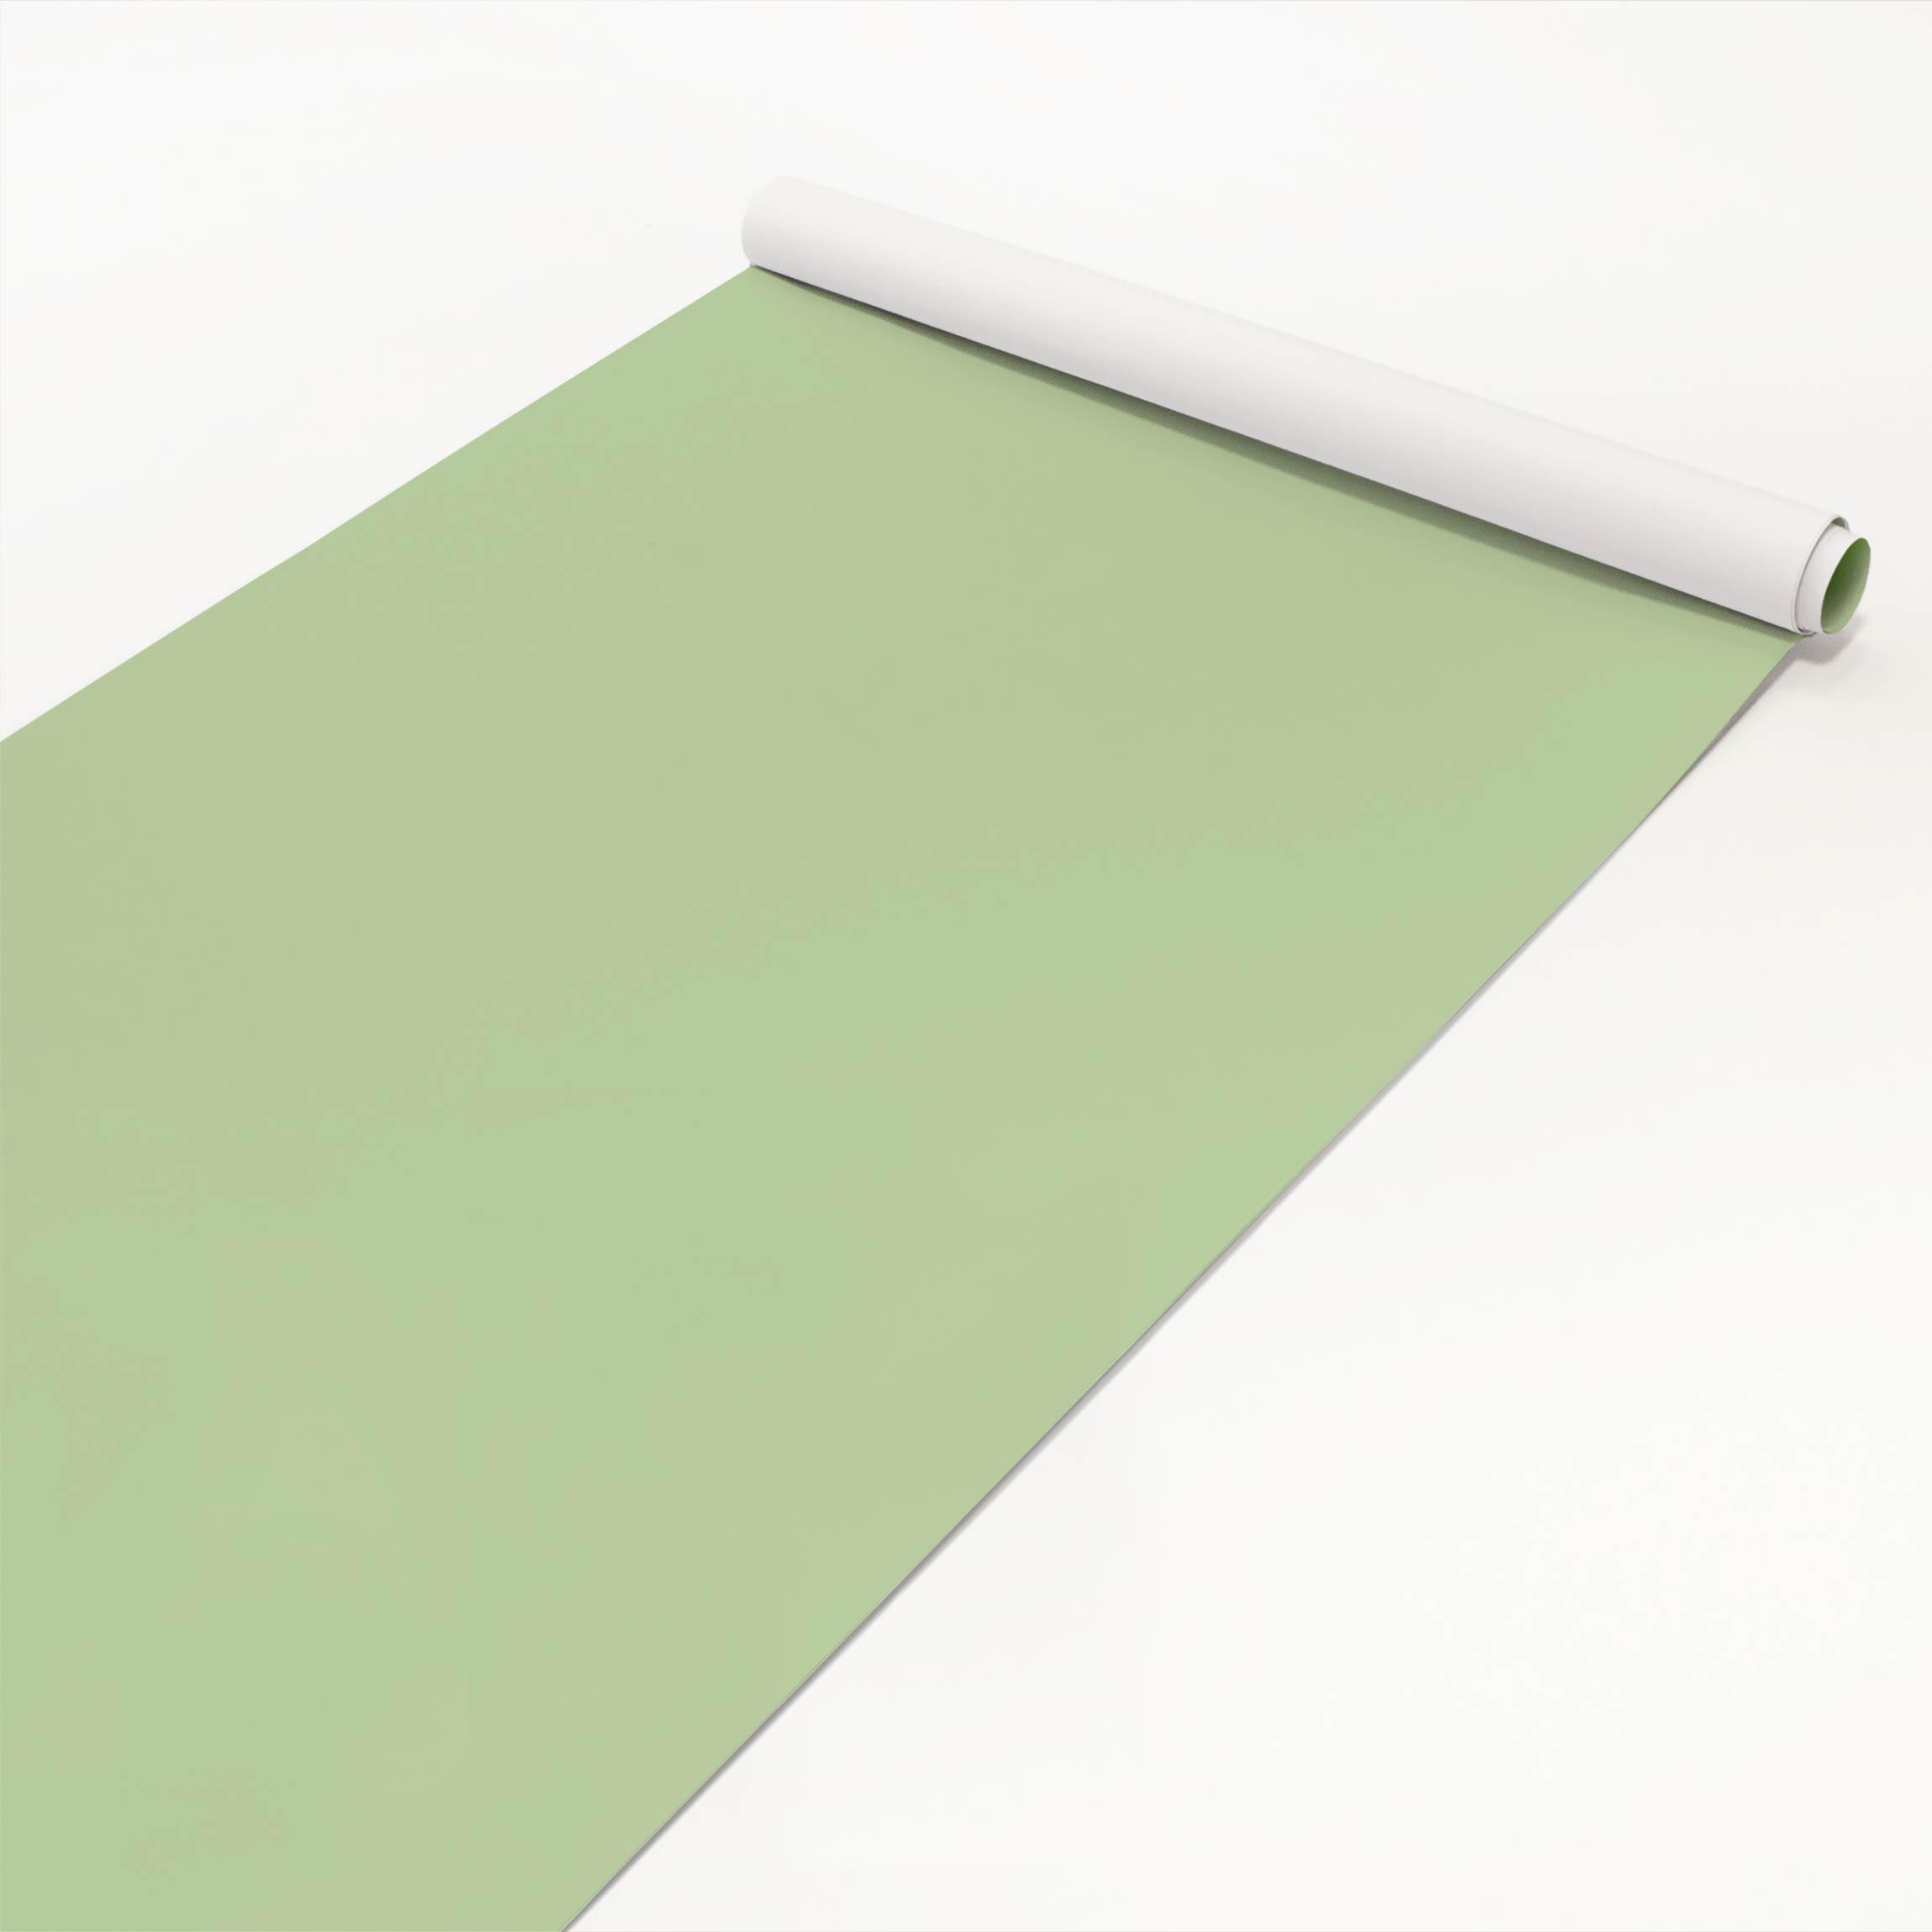 carta adesiva per mobili colour mint green. Black Bedroom Furniture Sets. Home Design Ideas